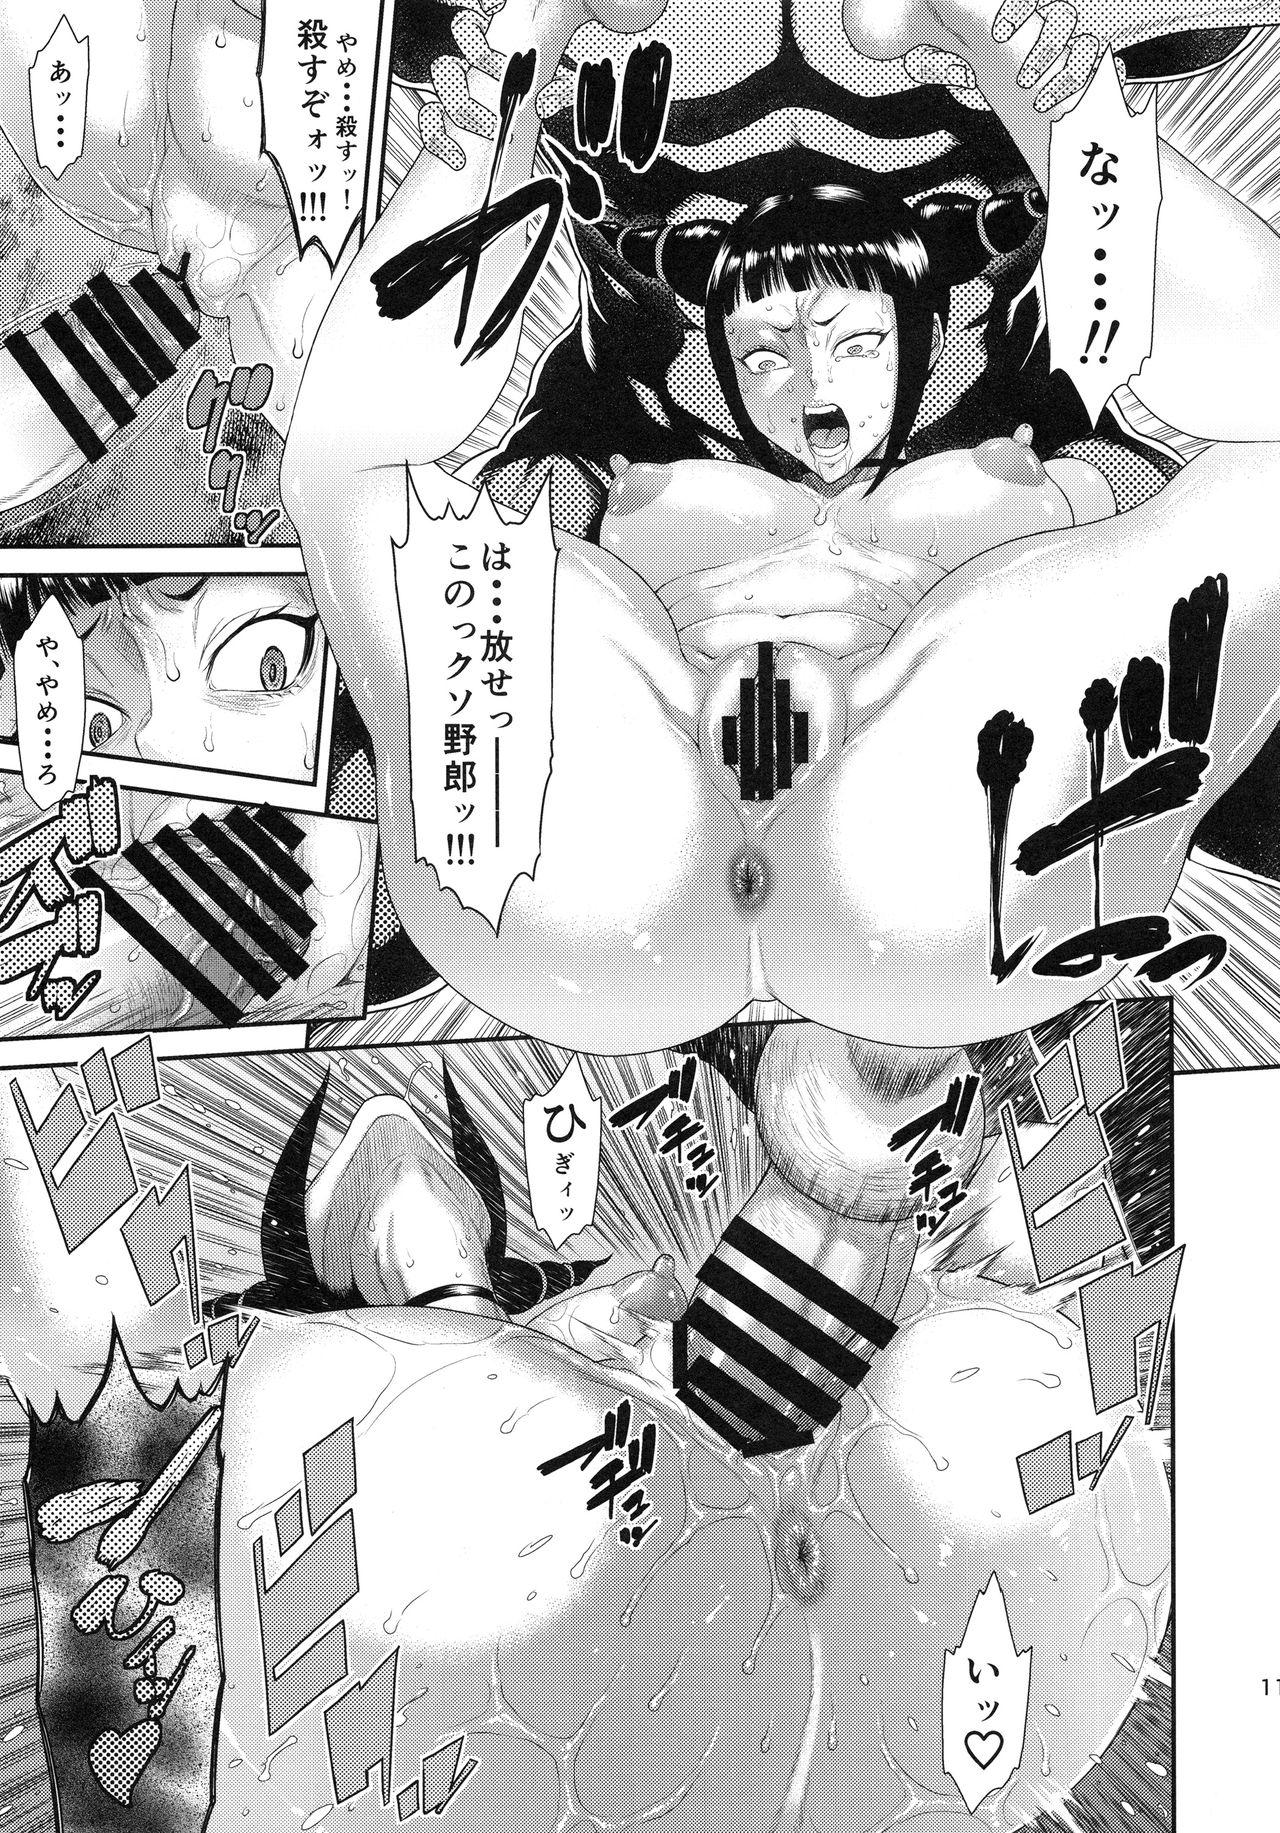 Jaaku - Wicked 9